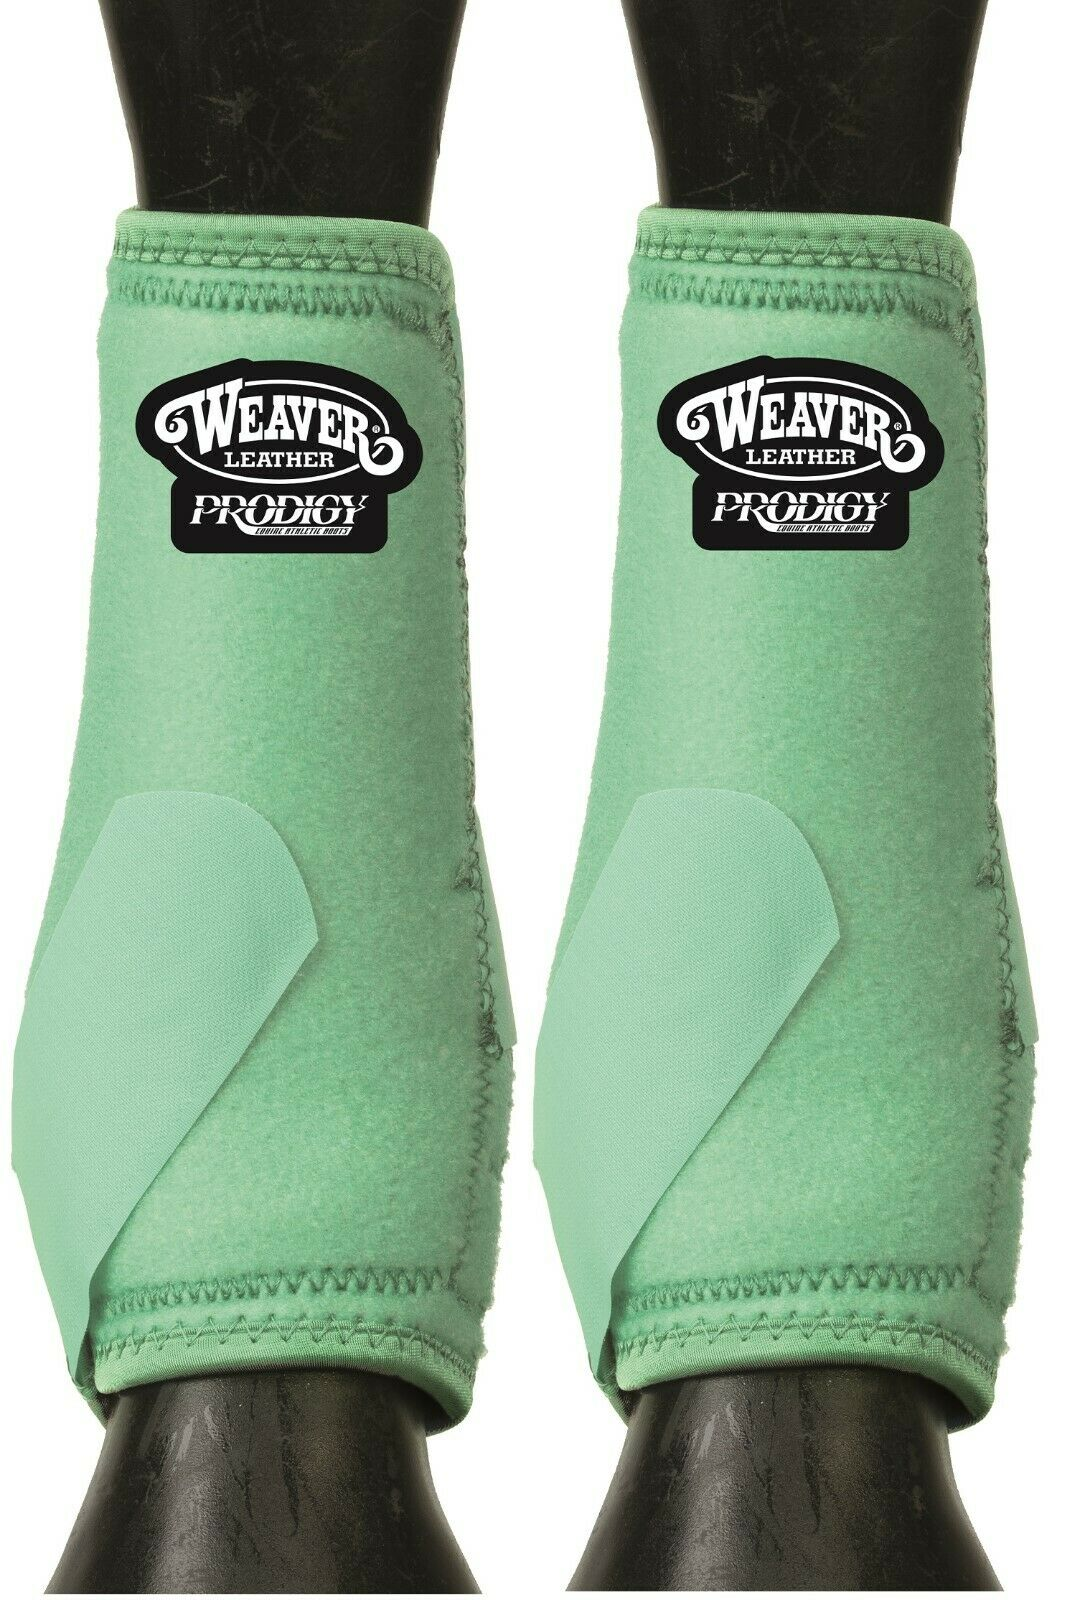 Weaver Leather Original Prodigy Performance Athletic SMB Stiefel 2 Pack Mint Grün